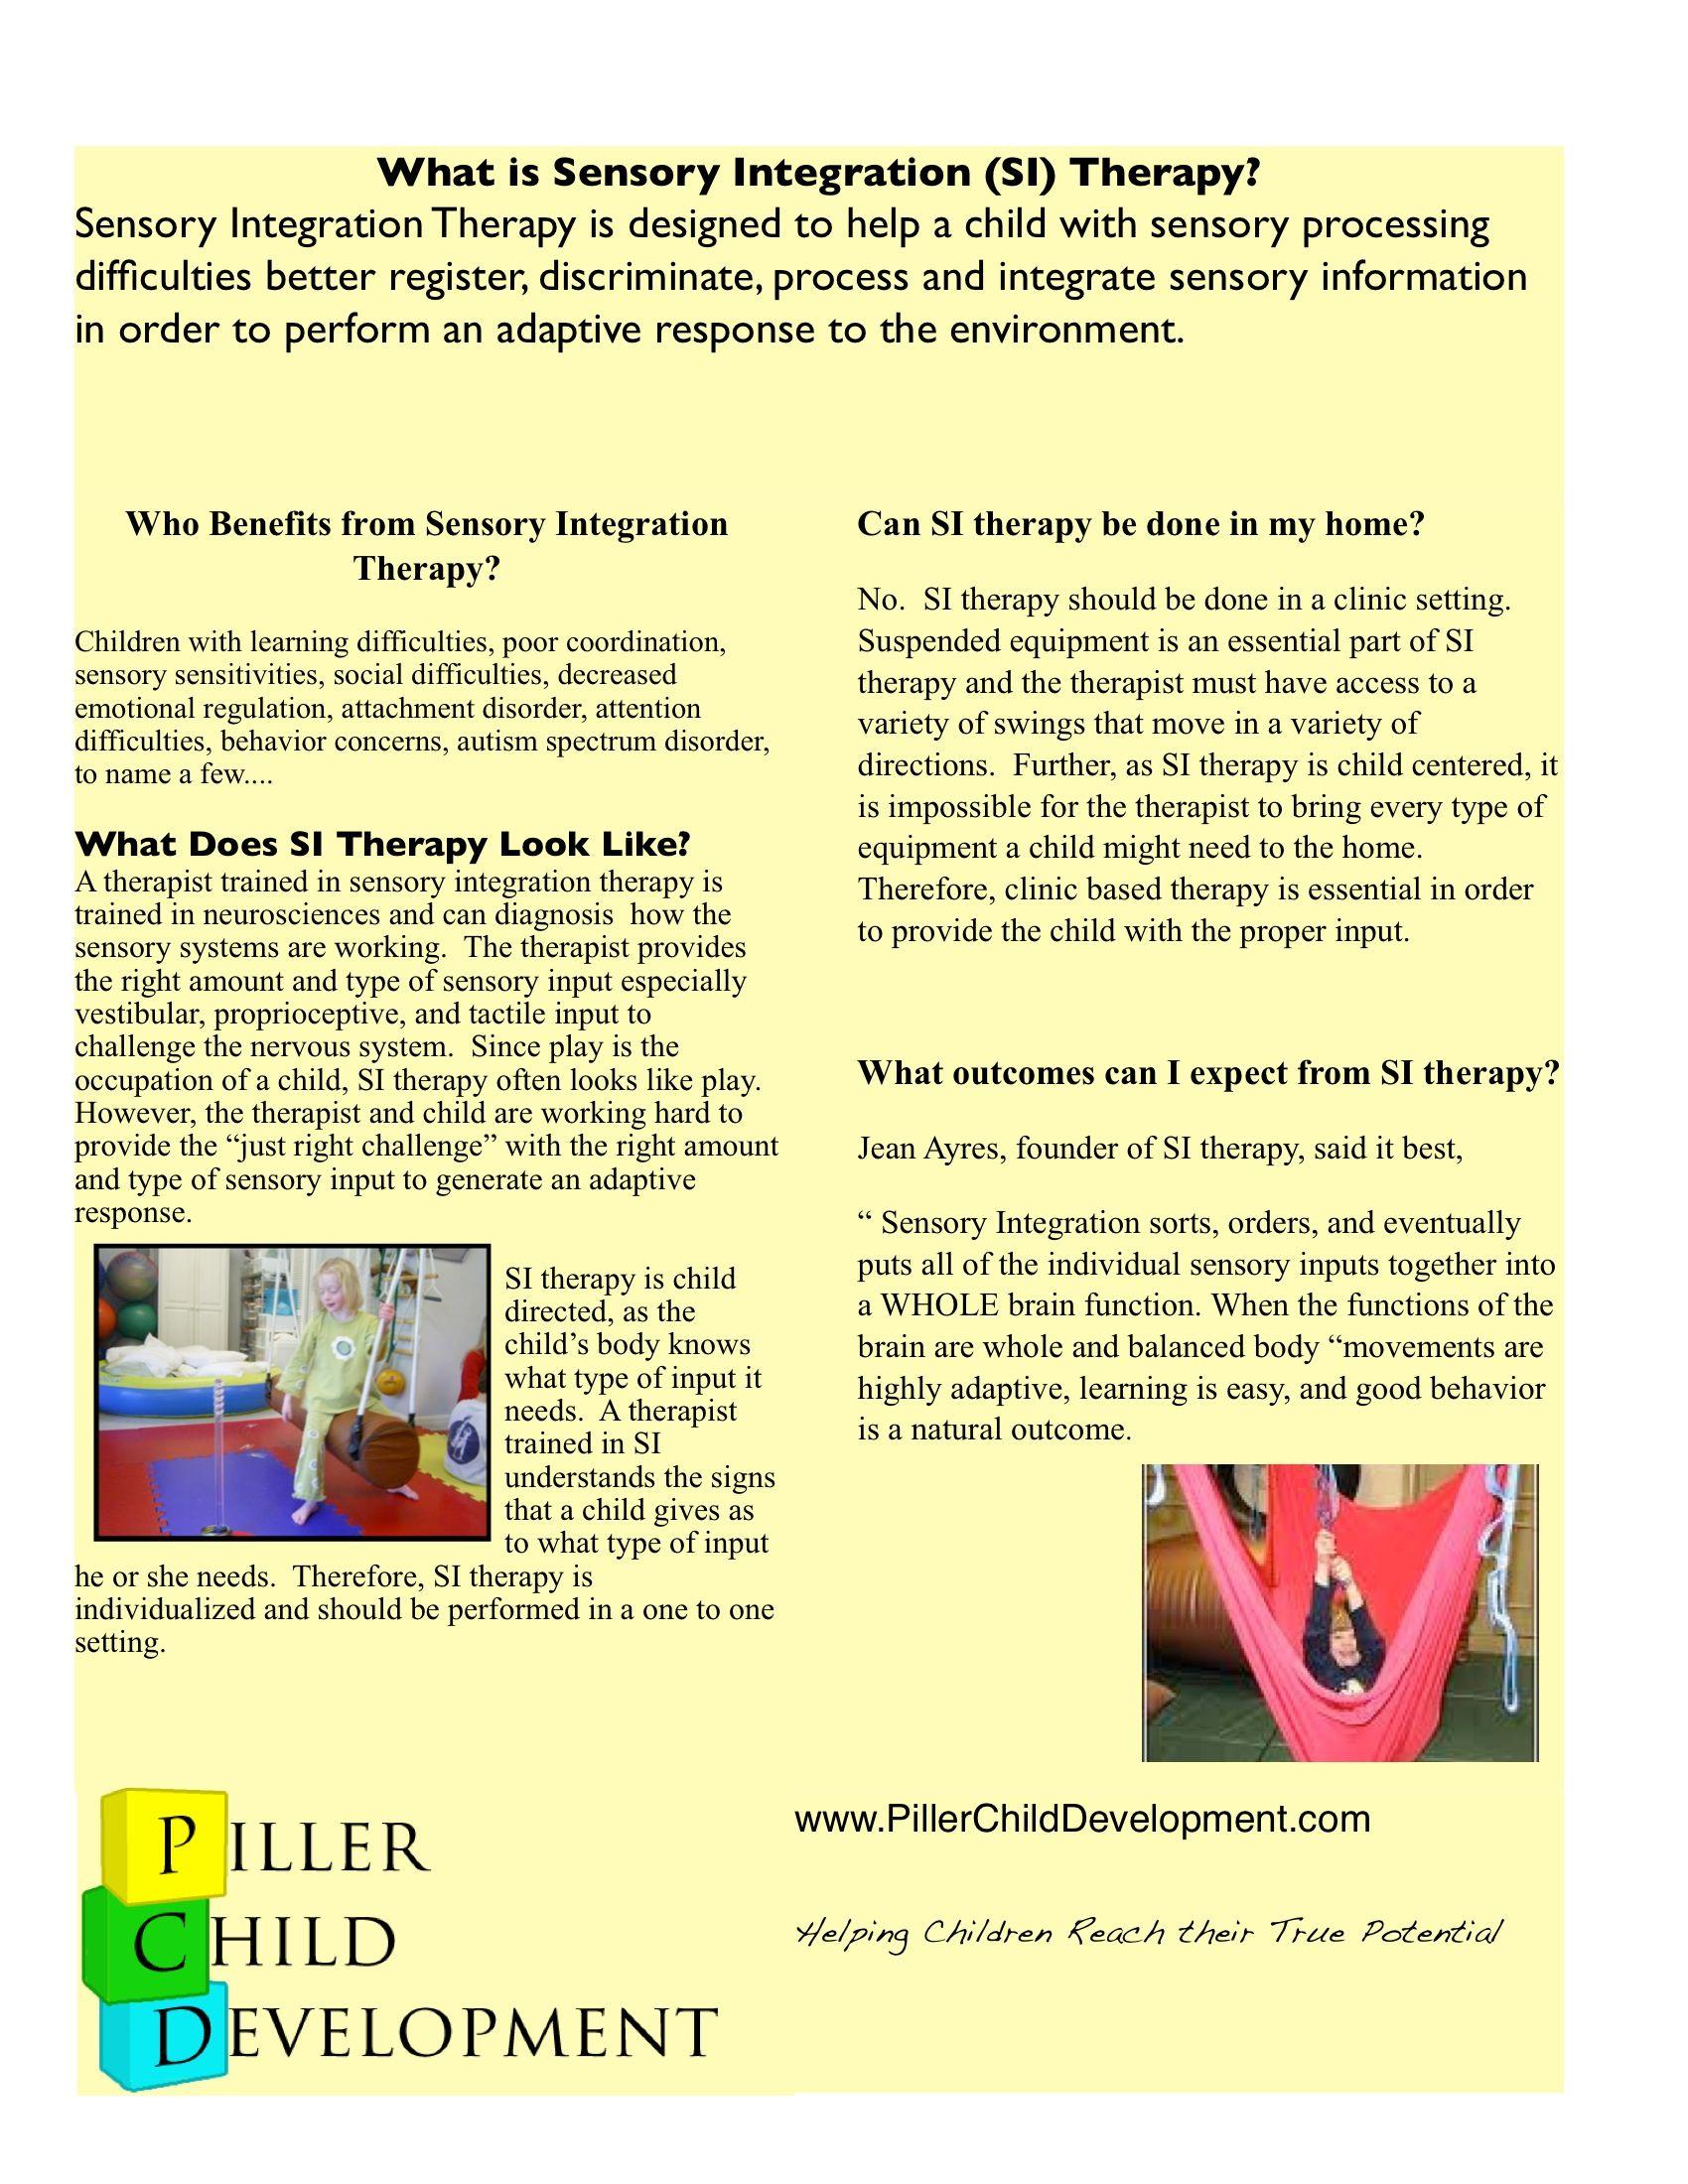 What is Sensory Integration Therapy? | Sensory Handouts